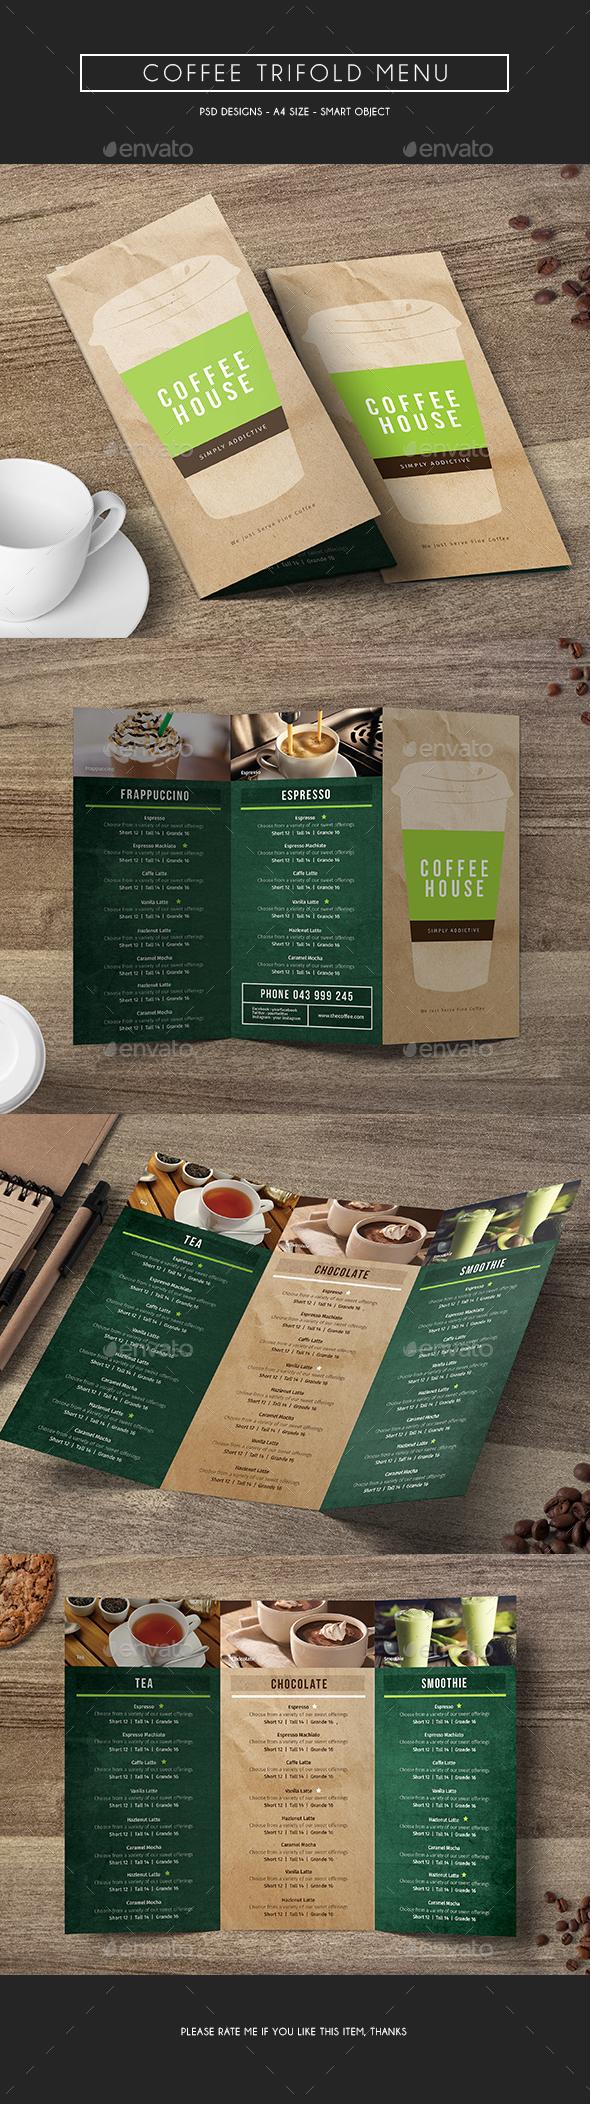 Coffee Trifold Menu